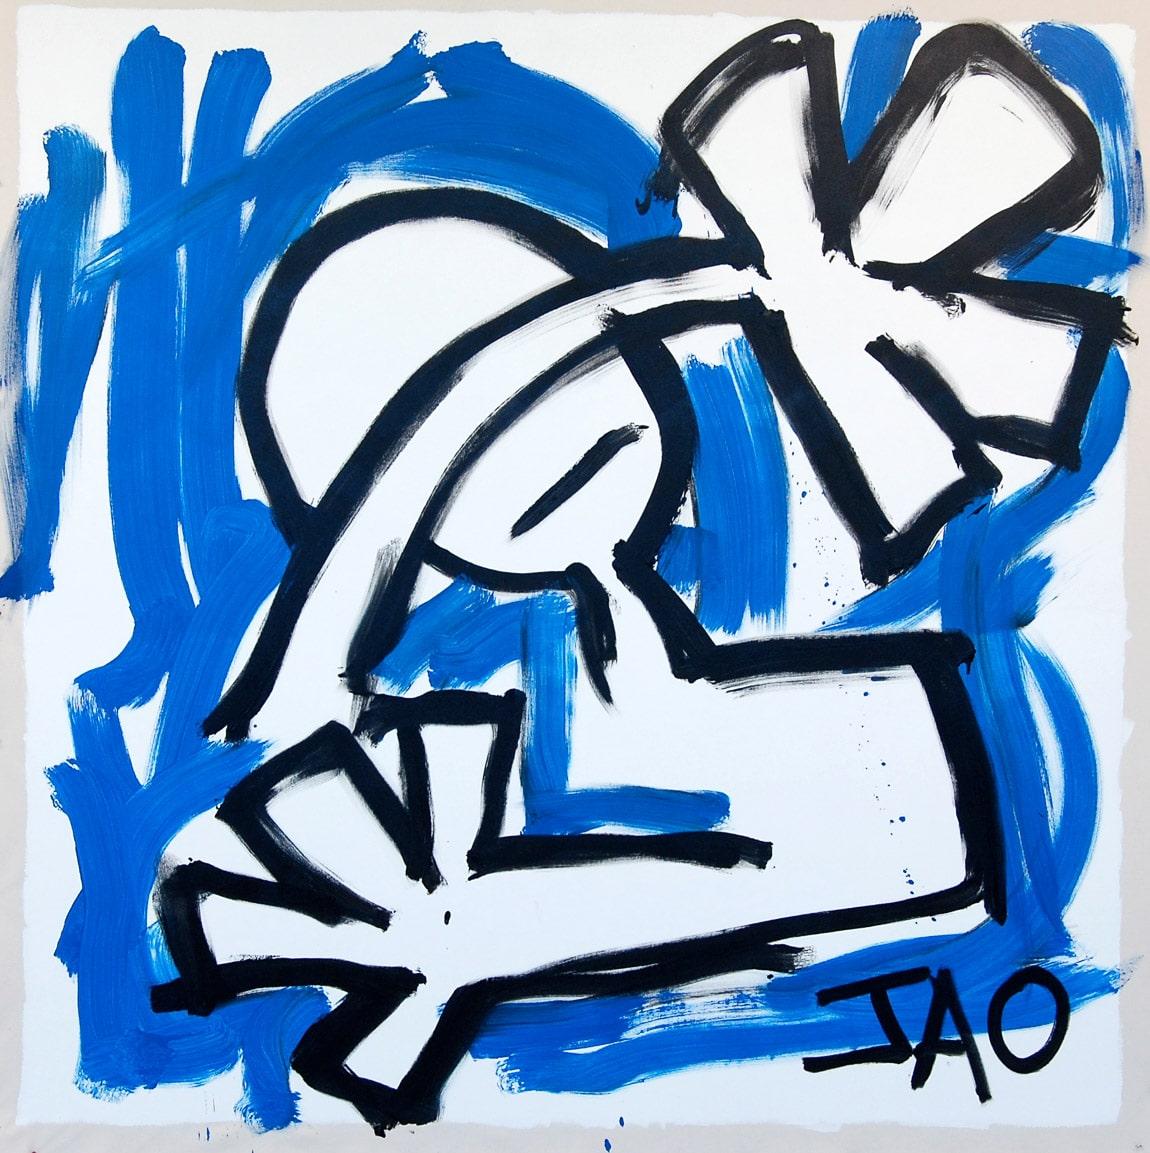 JAO-figure-xp-372r